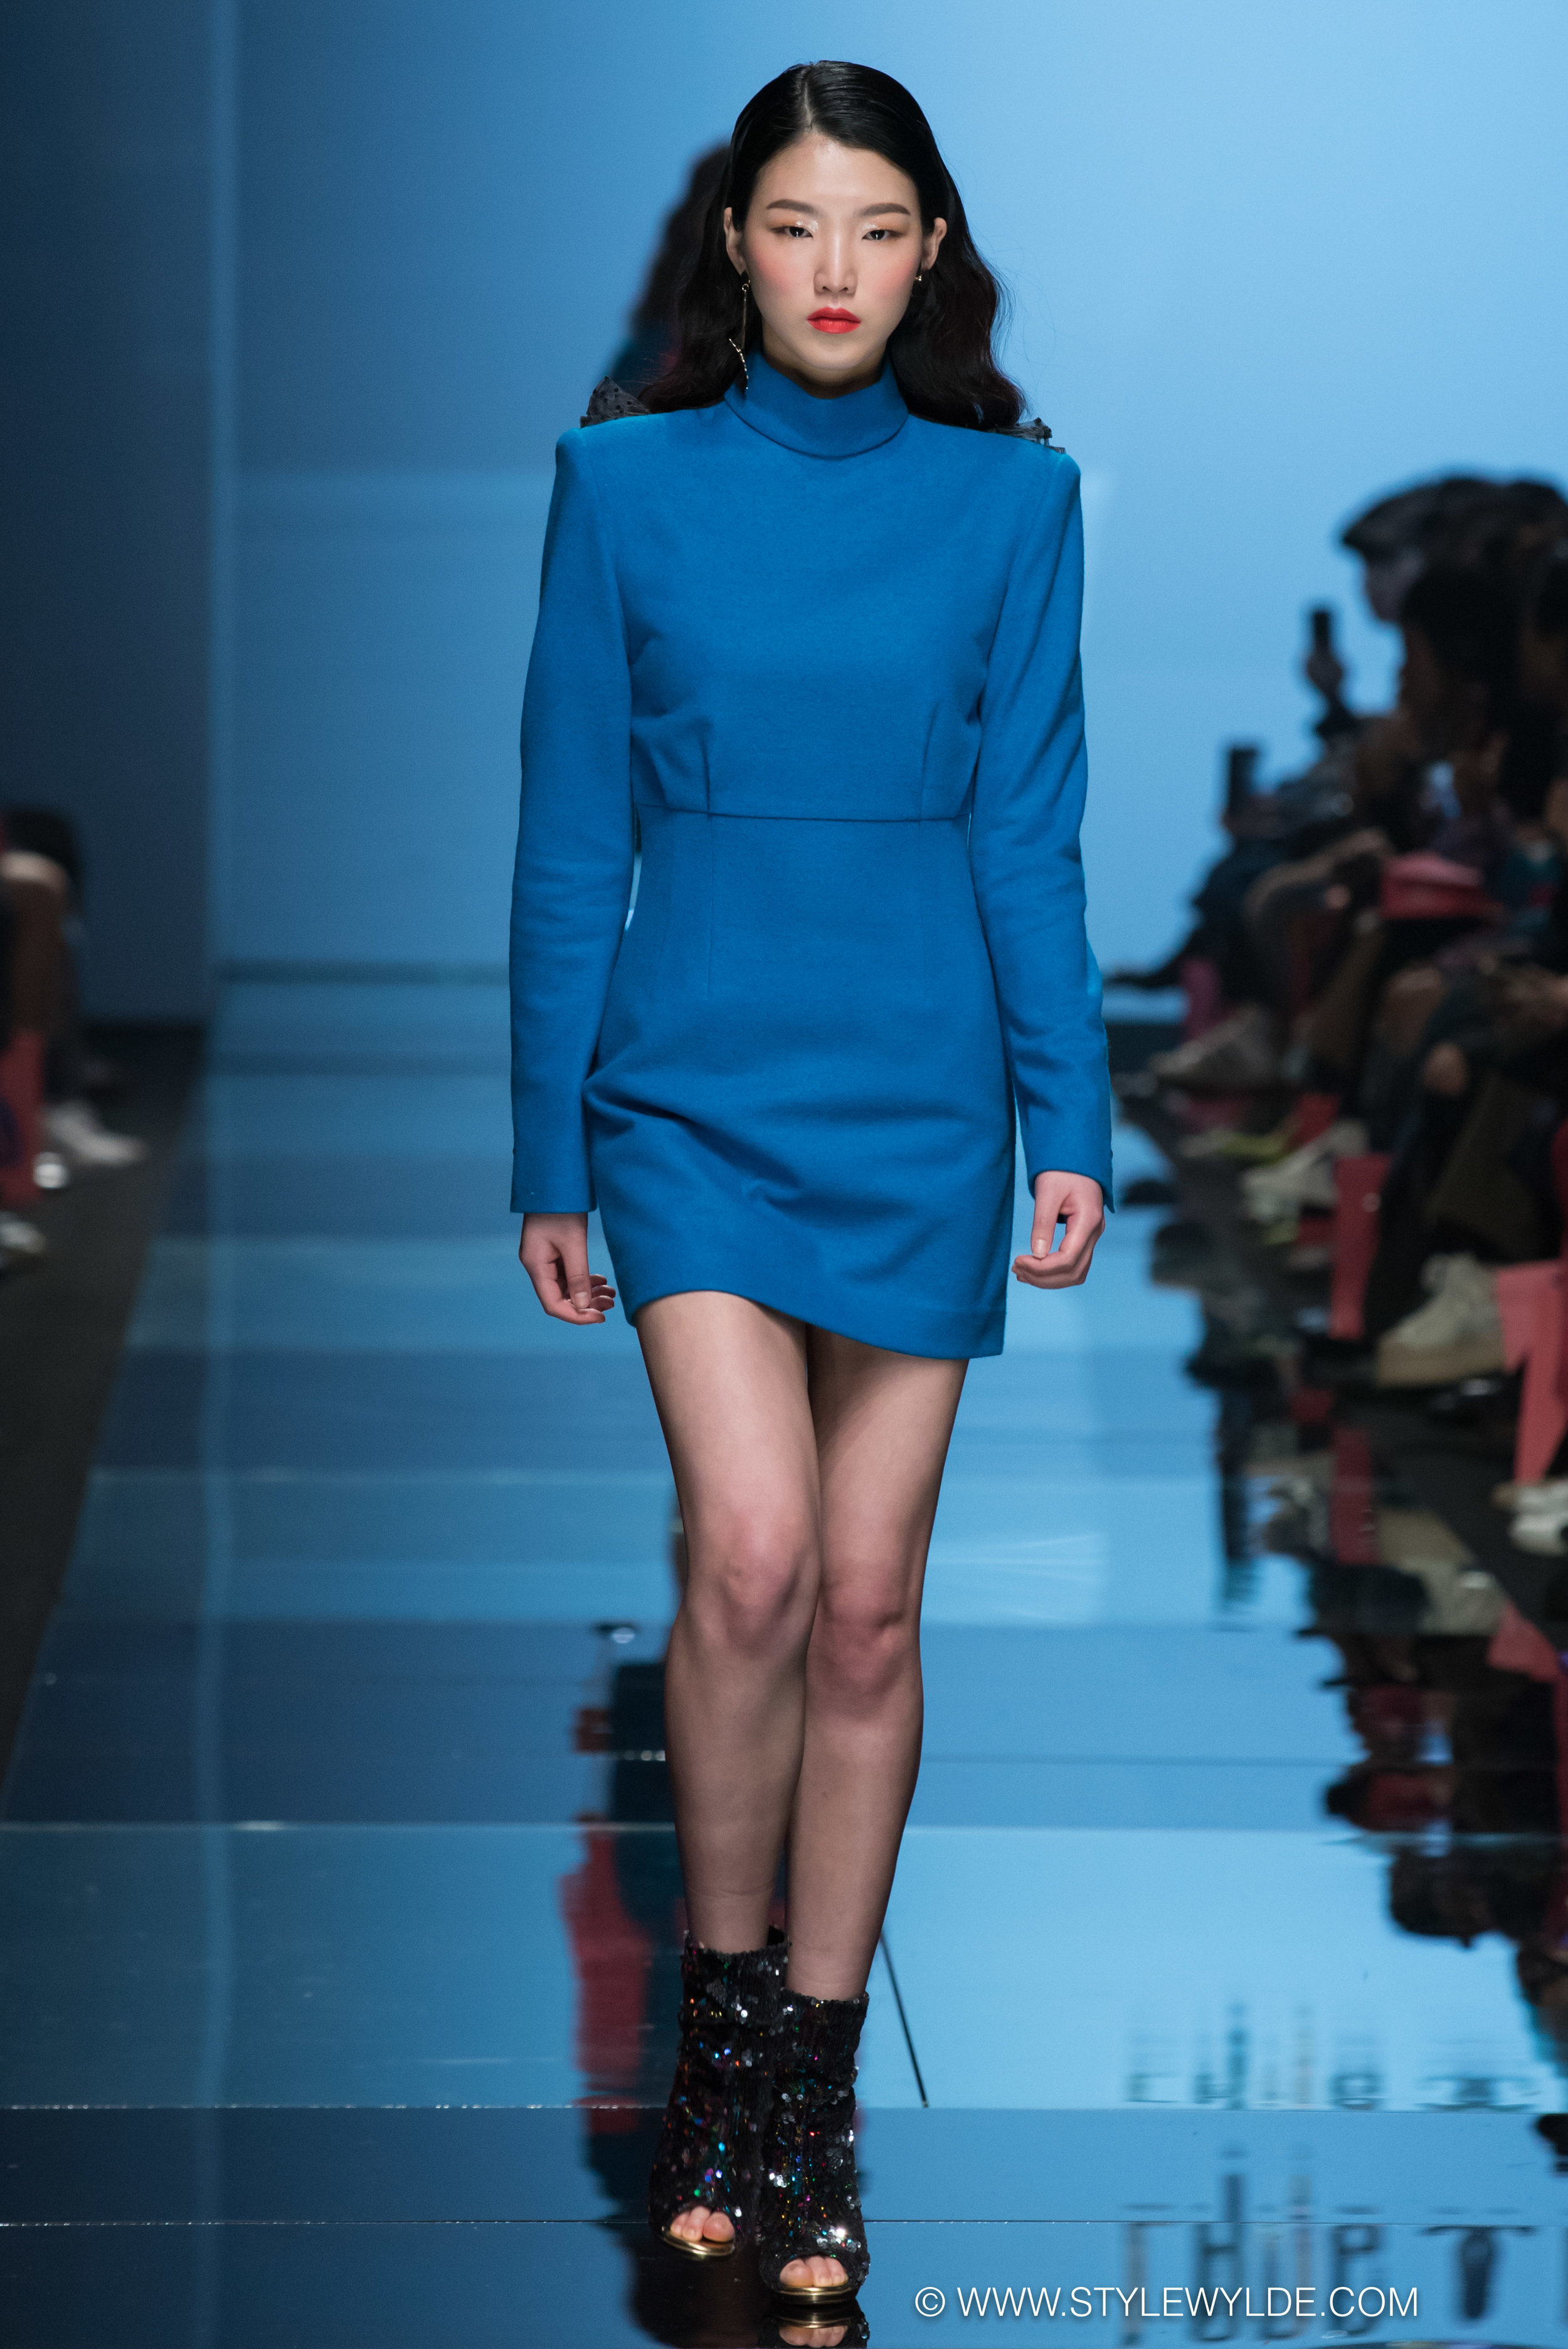 CynthiaHopeAnderson-HeraSeoul FashionWeekAW18-Lang&Lu-15.jpg